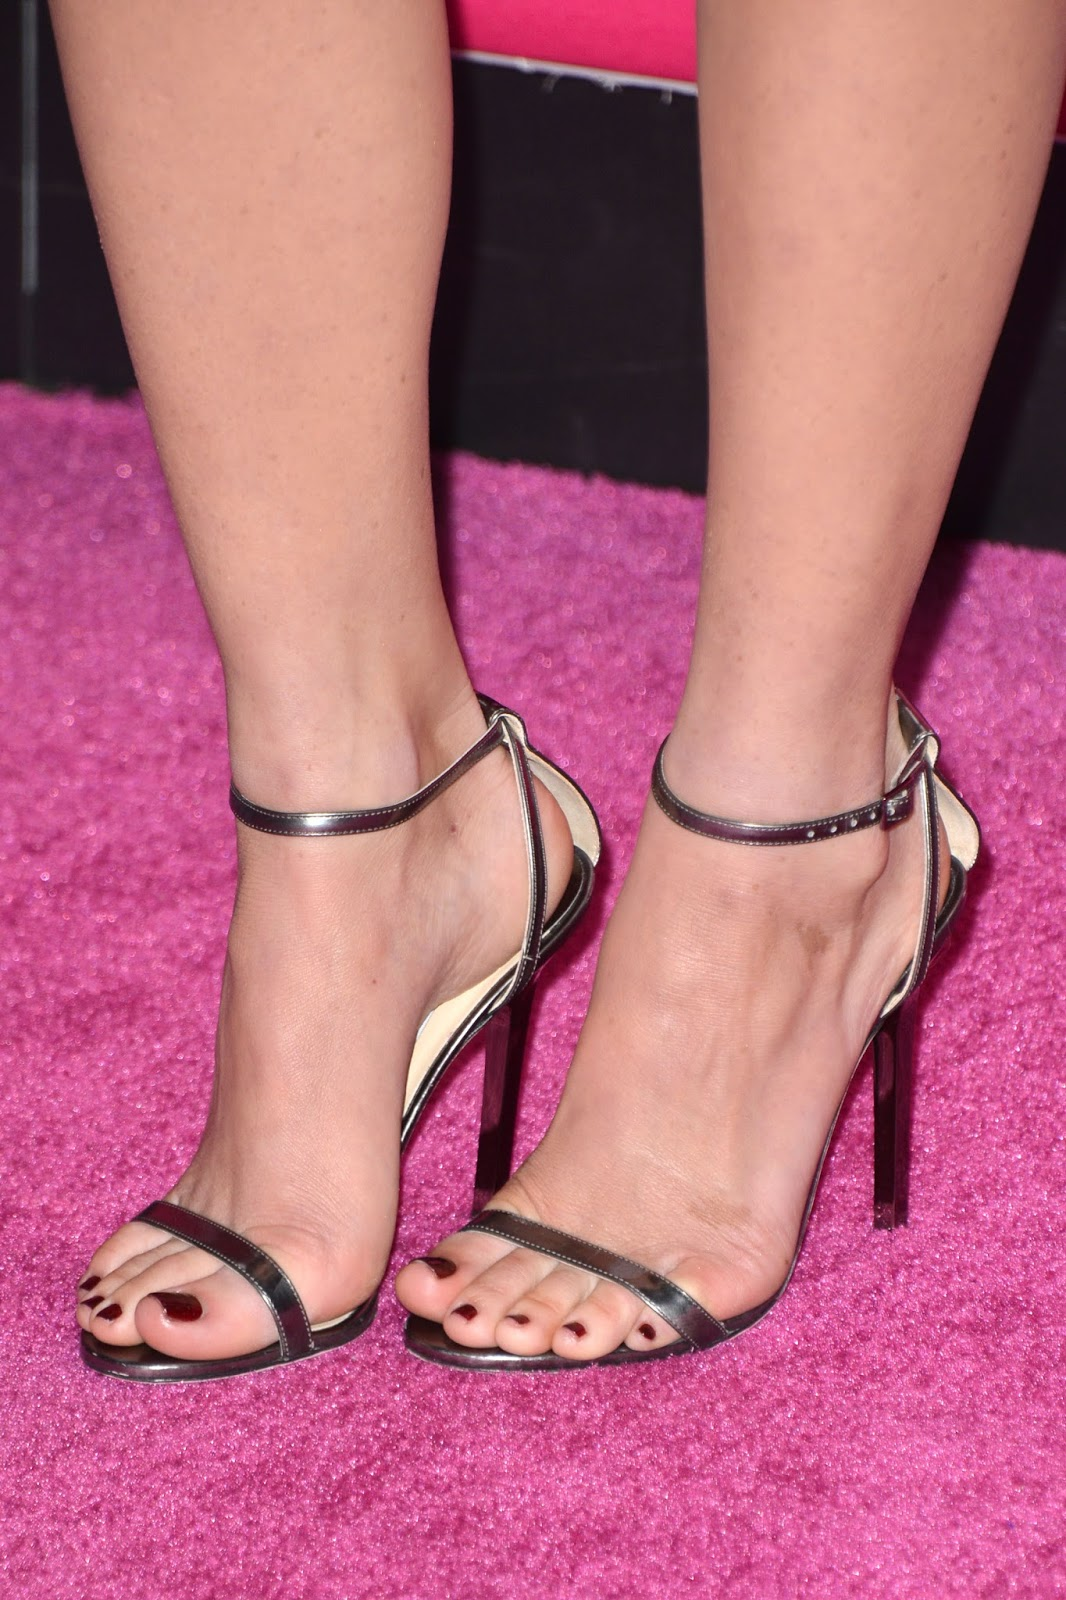 Olivia munn feet naked (24 image)